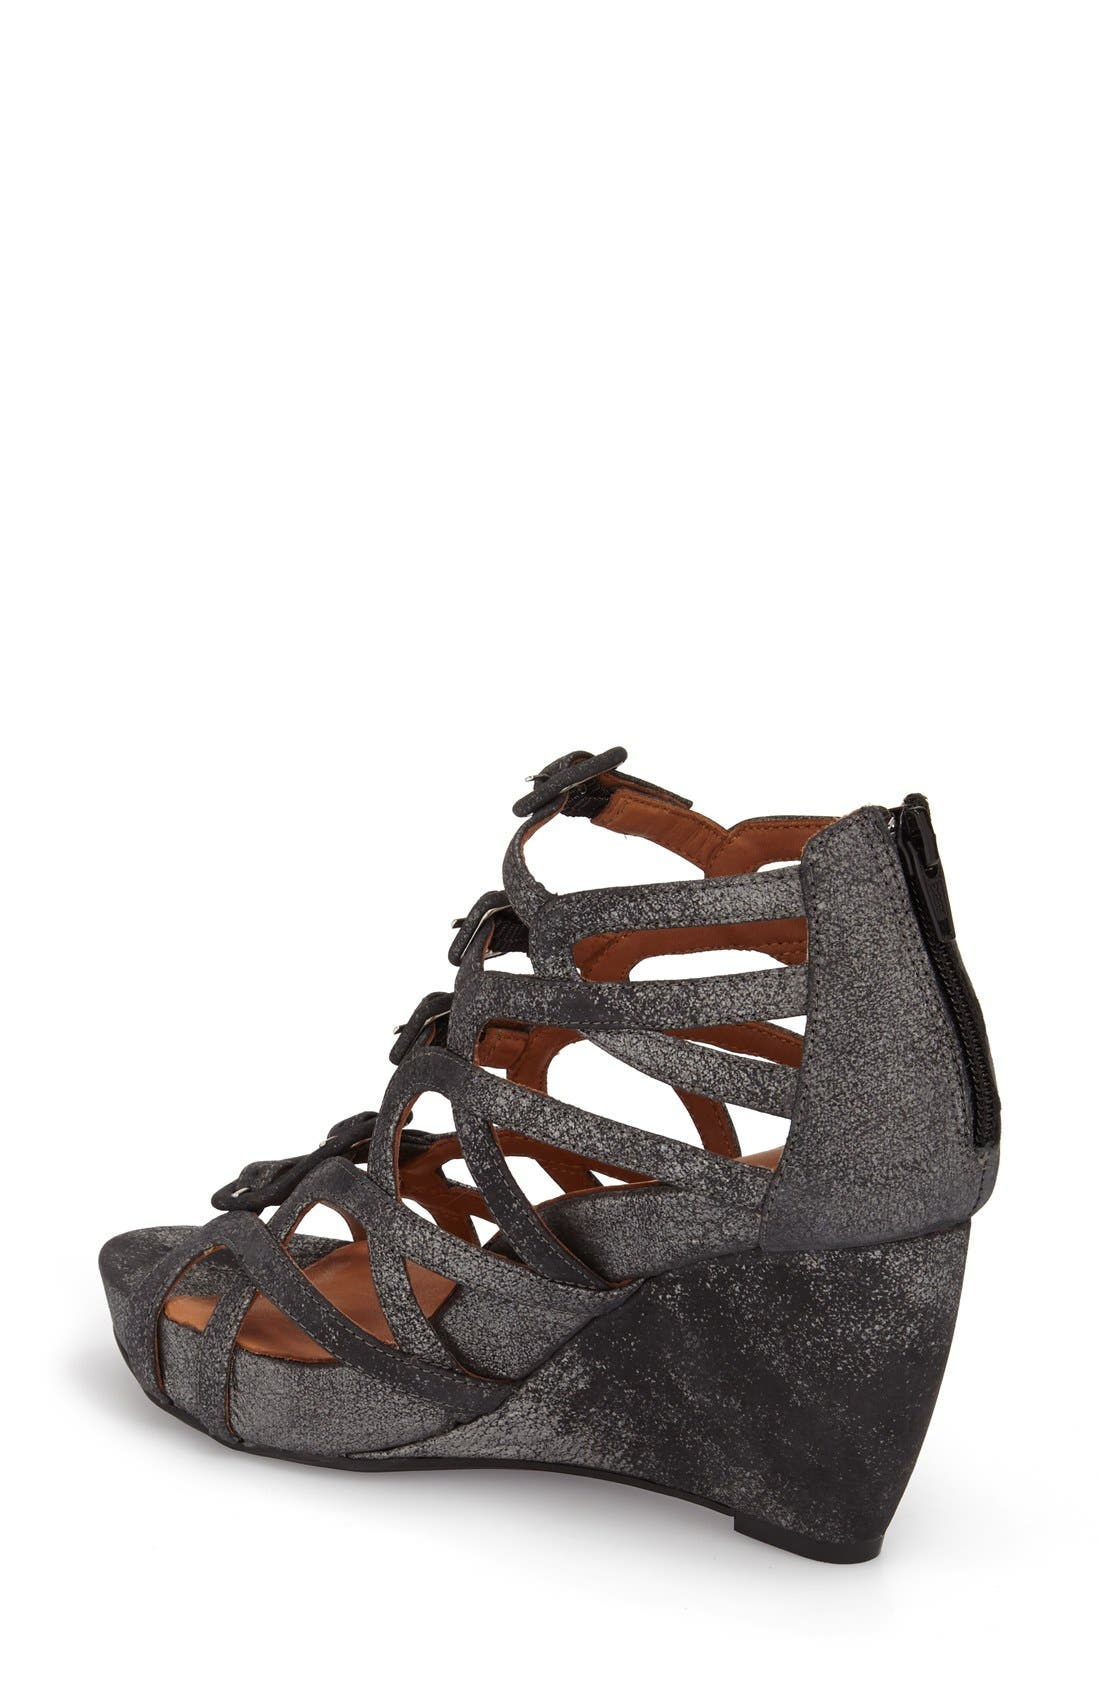 Ivanna' Gladiator Wedge Sandal,                             Alternate thumbnail 2, color,                             Graphite Leather